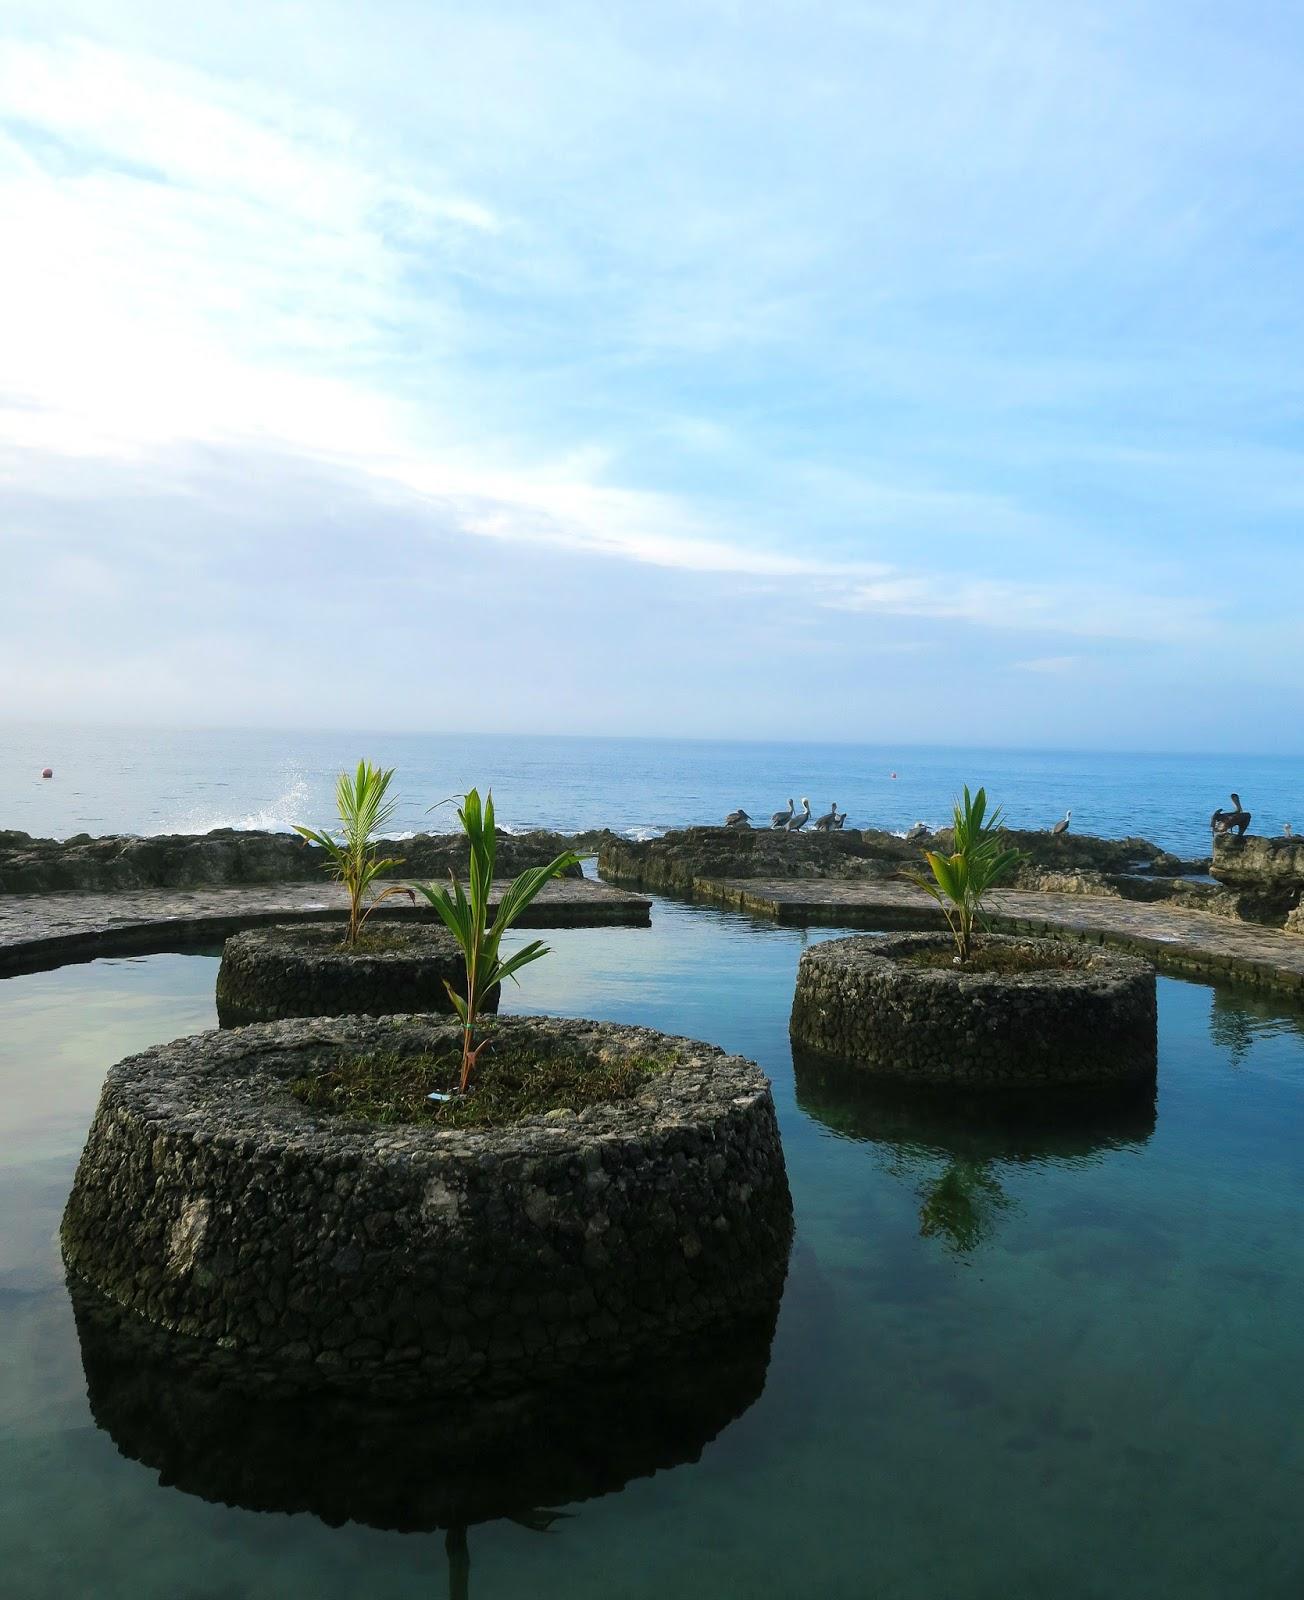 Sea pool at the Occidental resort